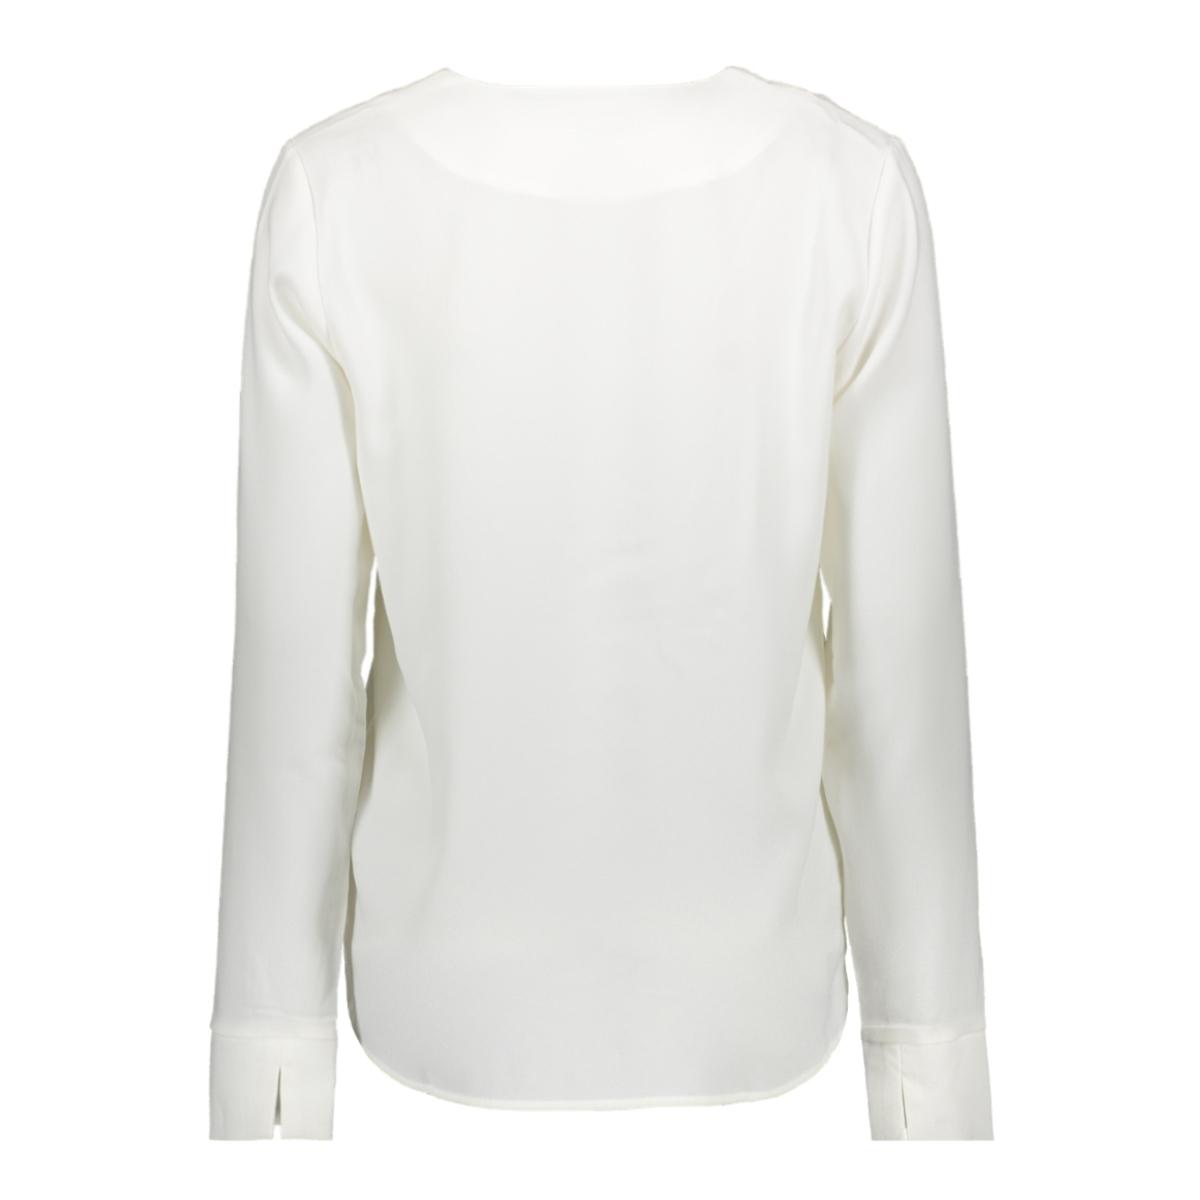 vilaia l/s v-neck top - fav 14053372 vila blouse cloud dancer